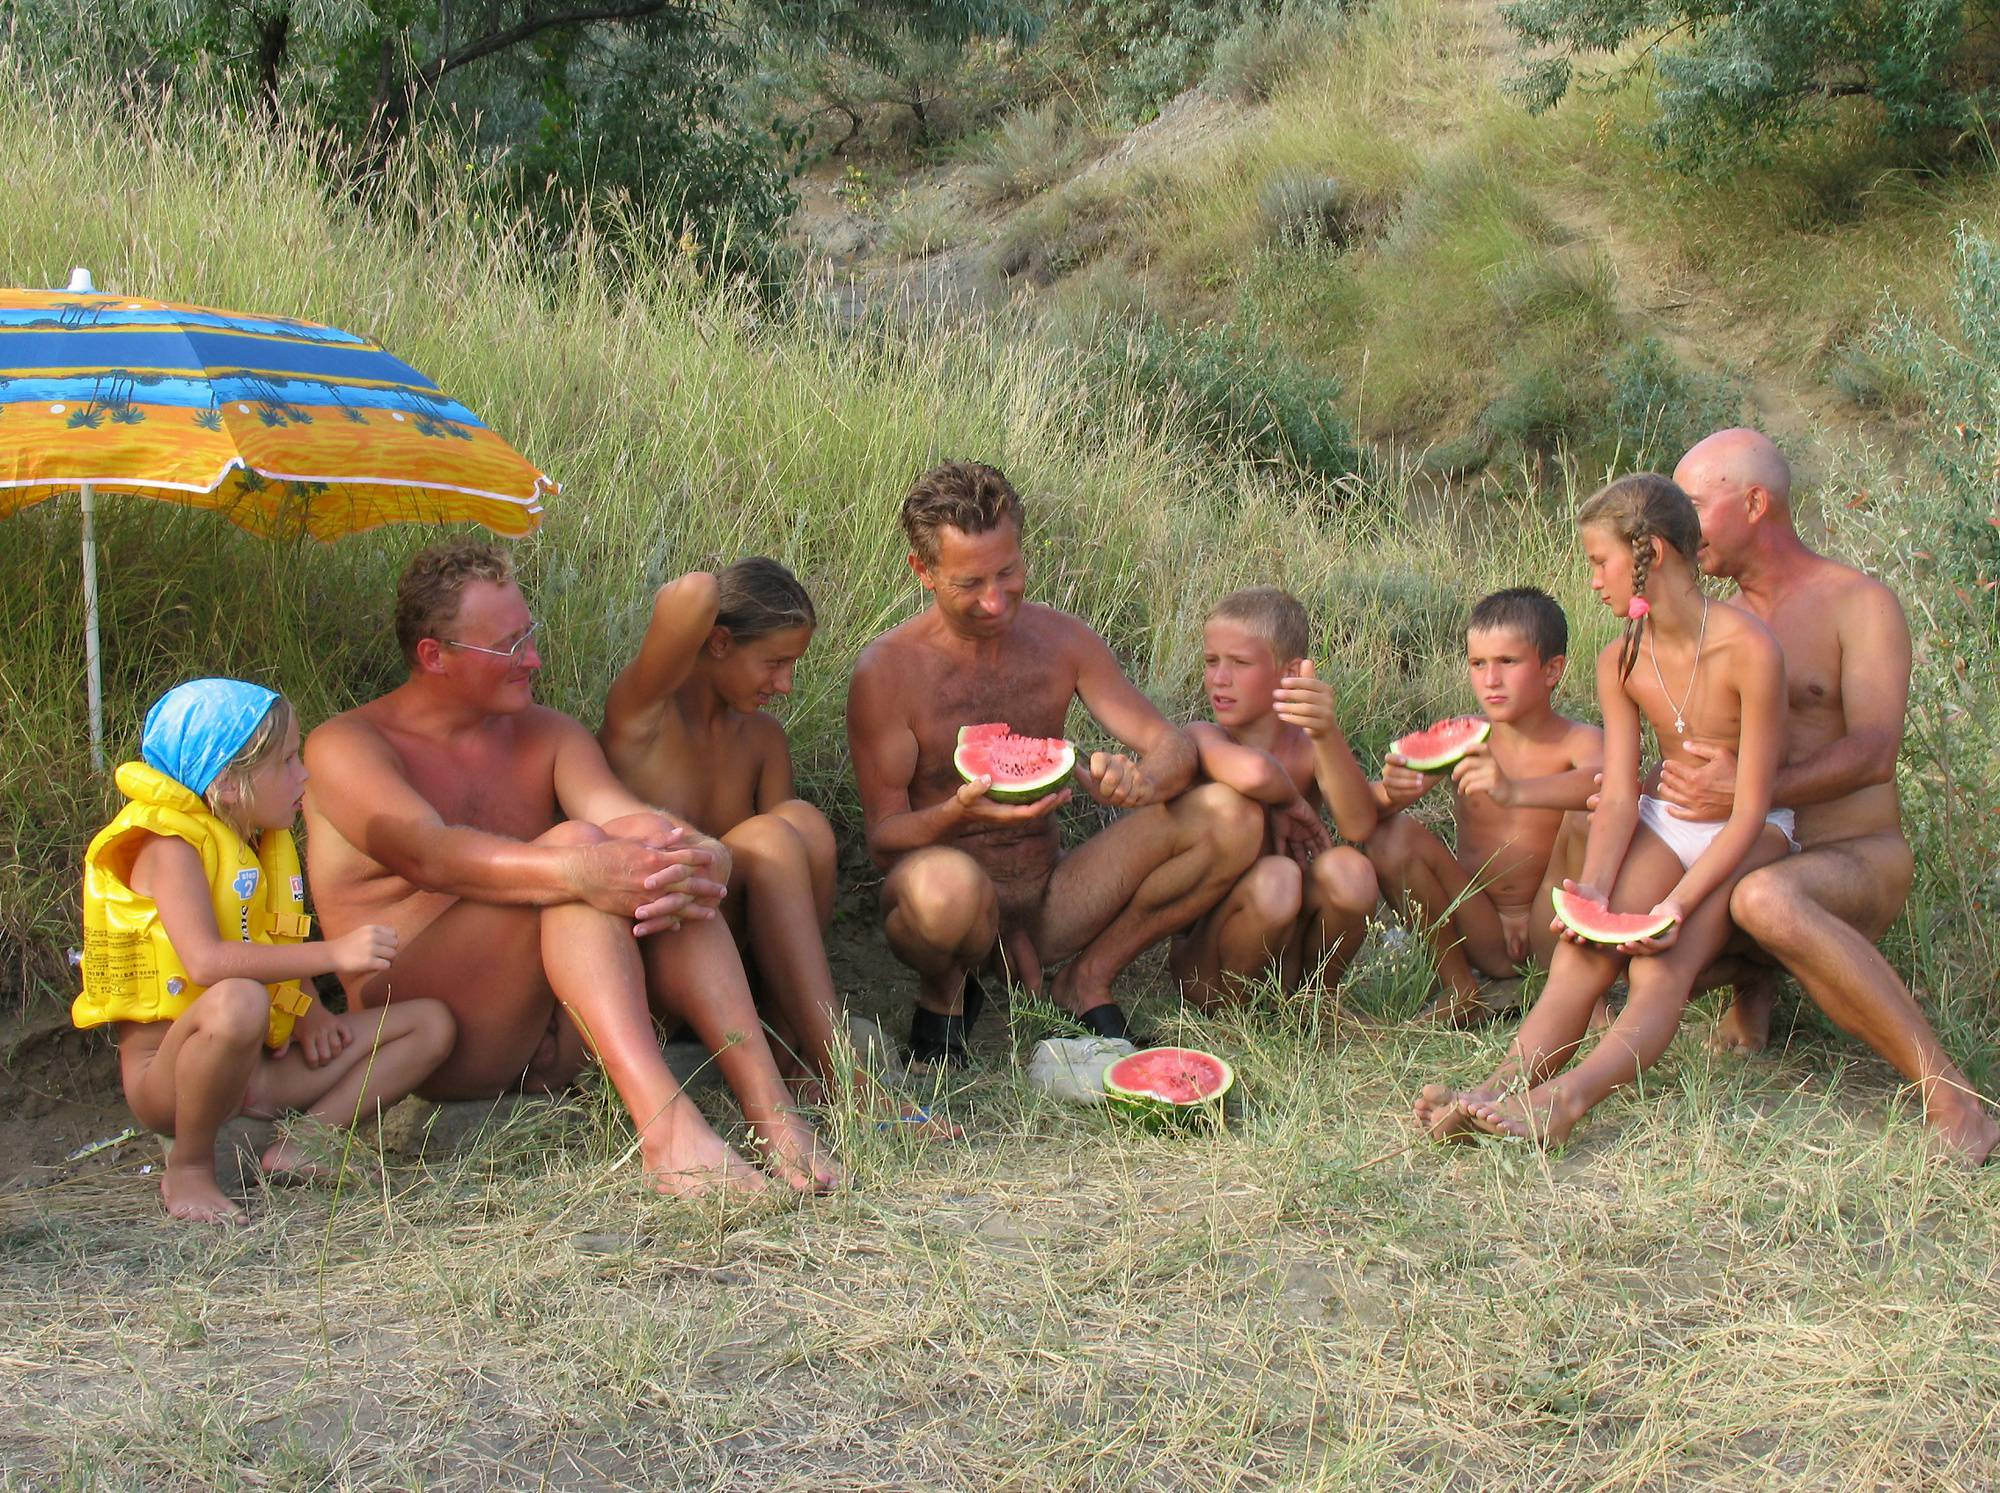 Nudist Gallery The Grassland Belt Show - 2